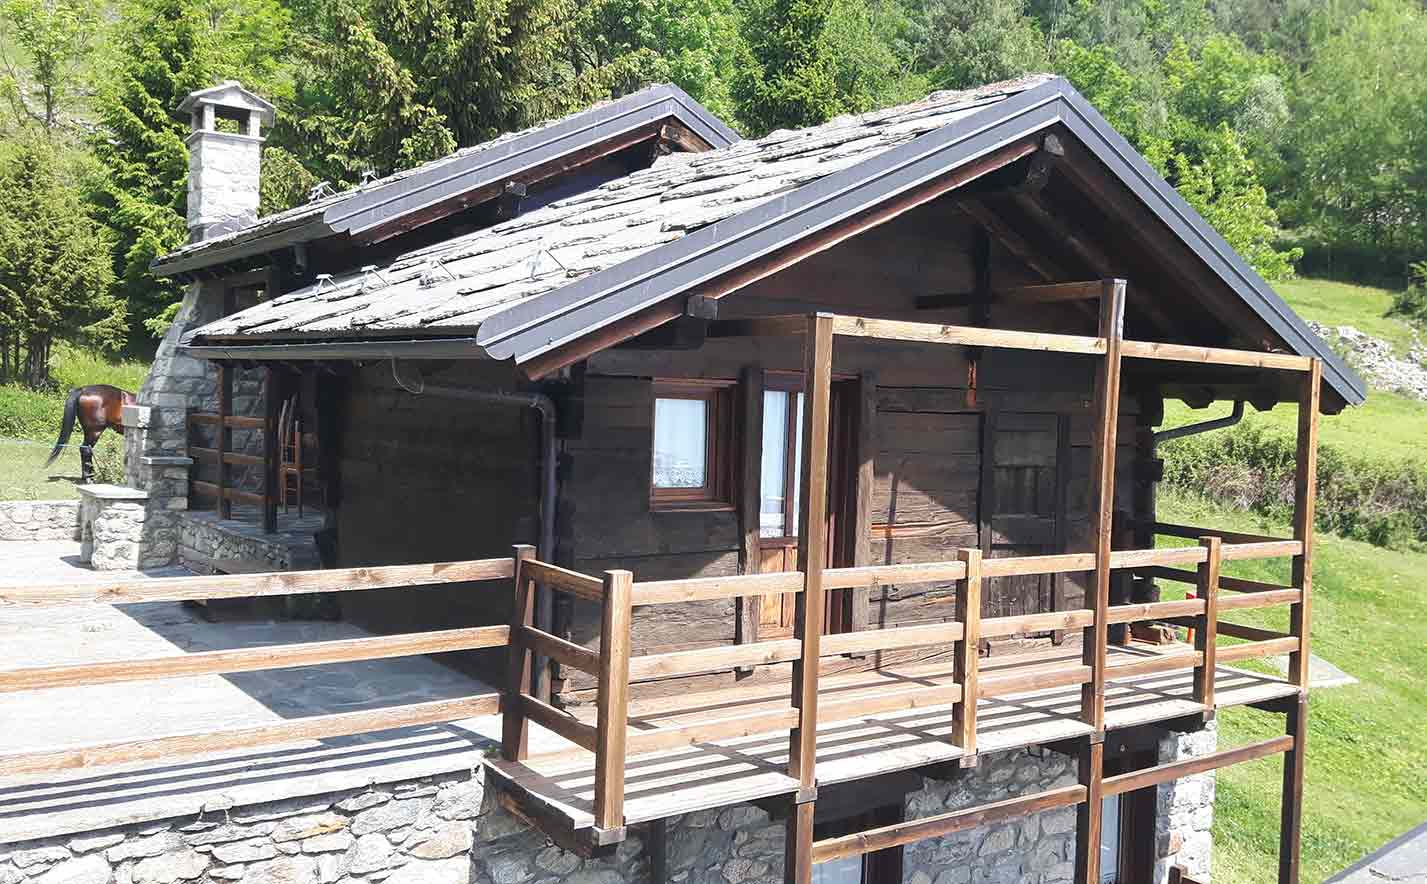 Chalet in stile alpino Mont Avic